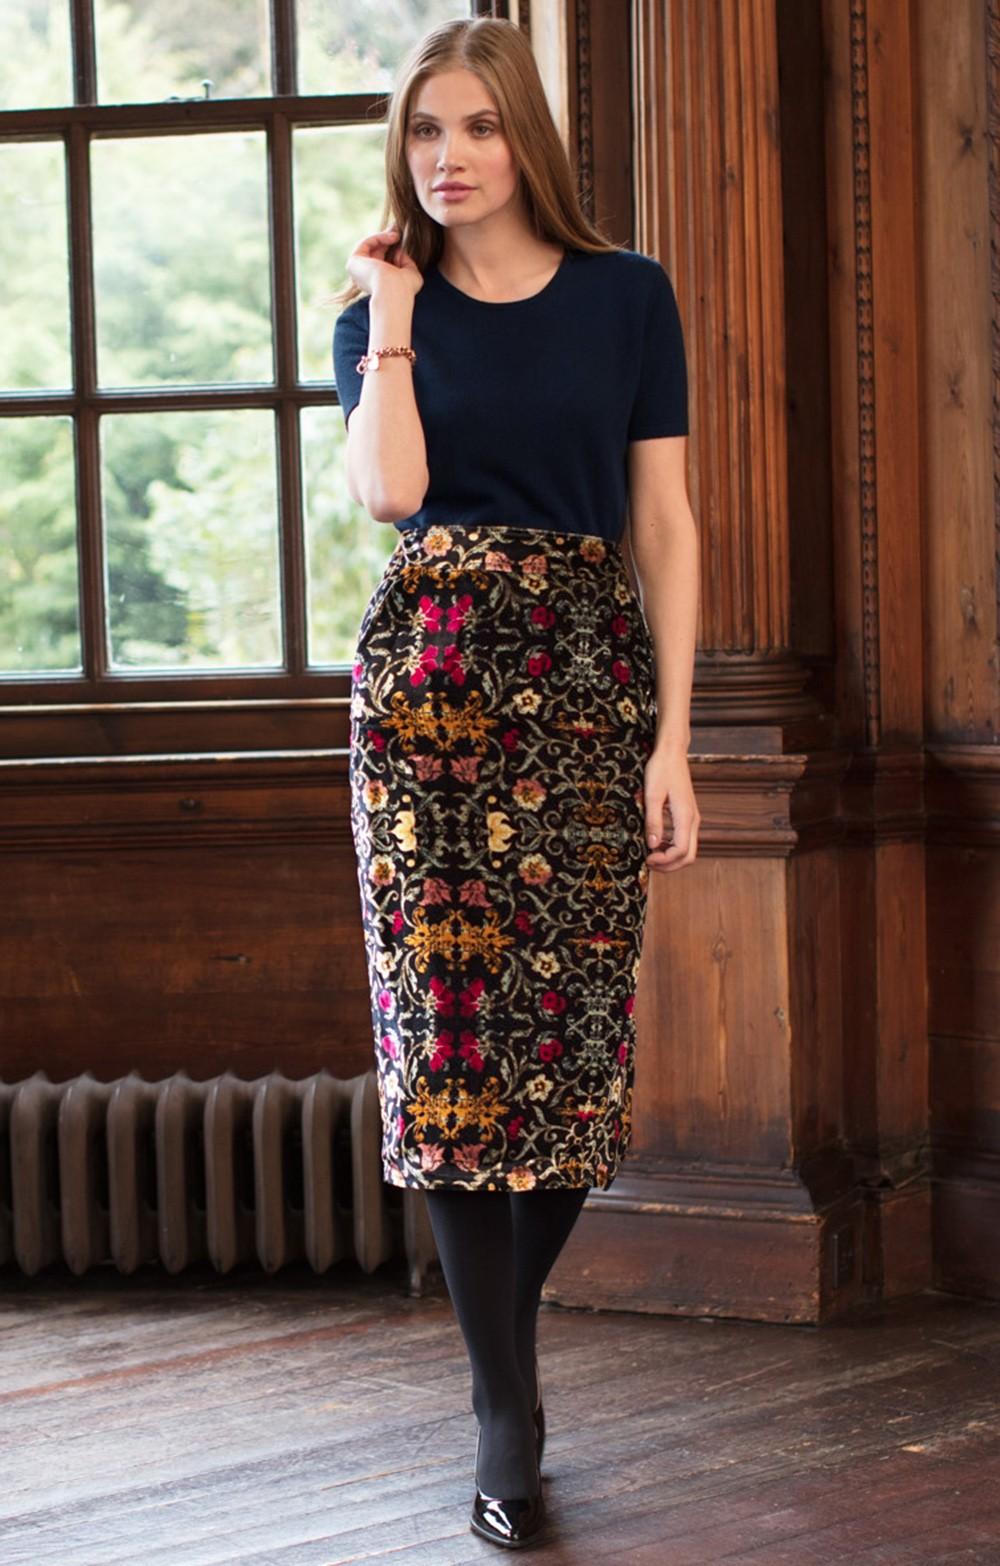 357401143a2a Printed Velvet Pencil Skirt - House of Bruar